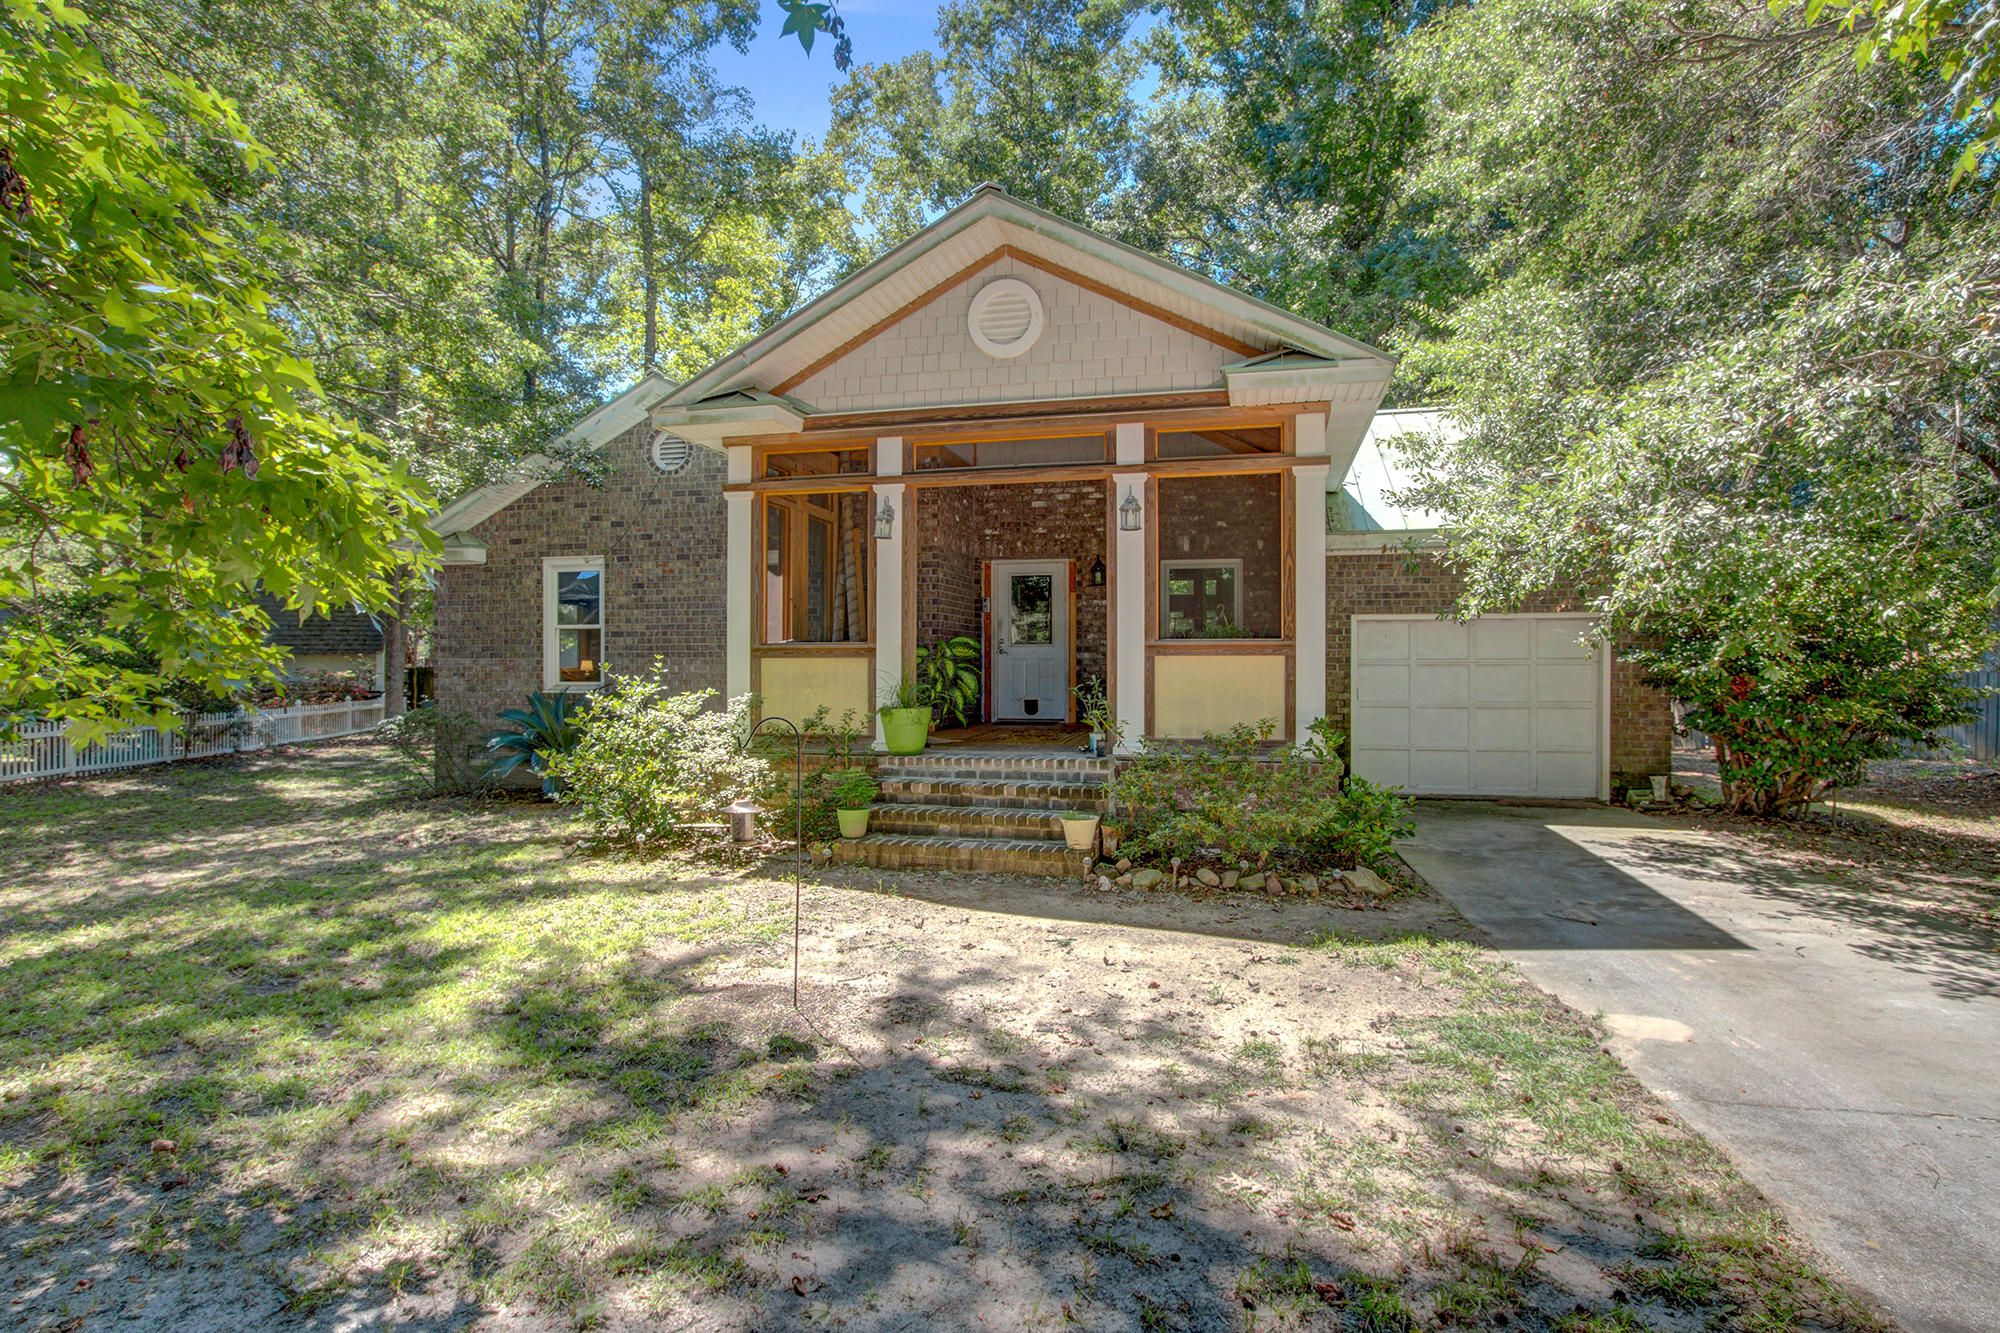 Wando Lakes Homes For Sale - 858 Fairlawn, Mount Pleasant, SC - 14